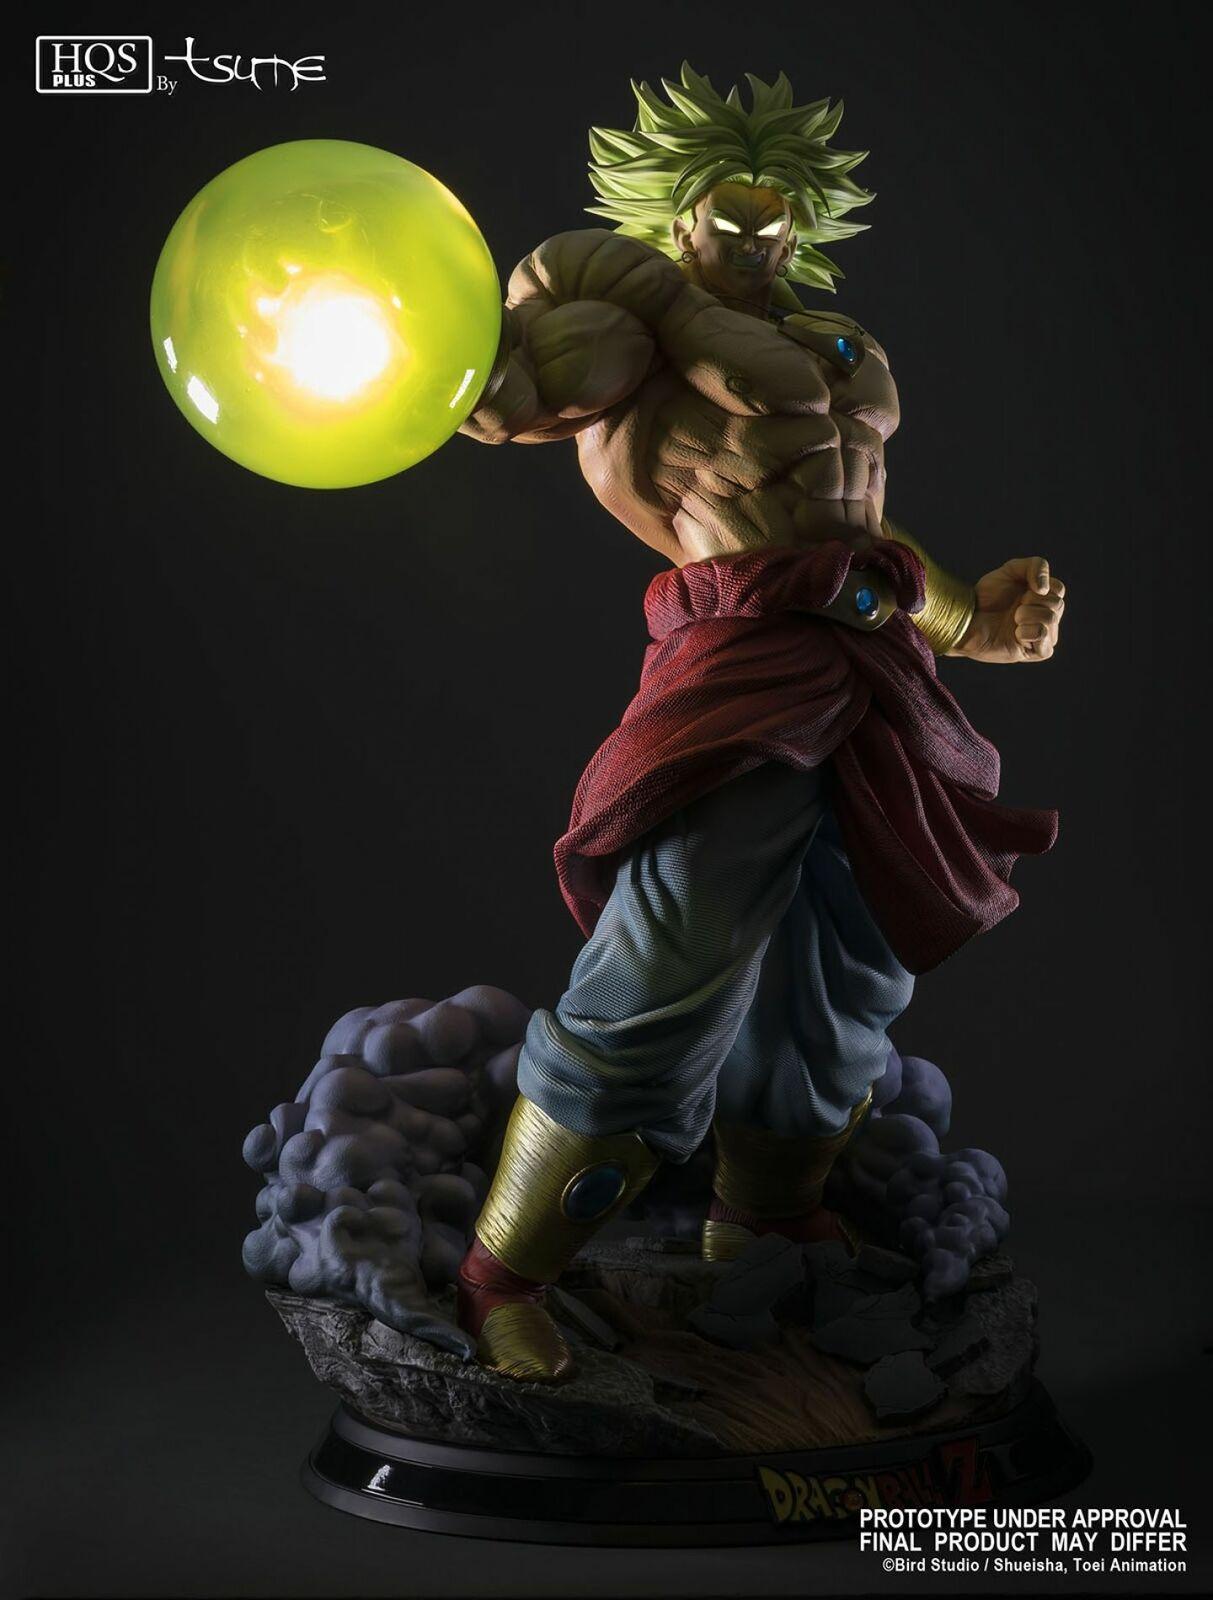 Broly - Legendary Super Saiyan King of Destruction Version HQS+ by TSUME DBZ